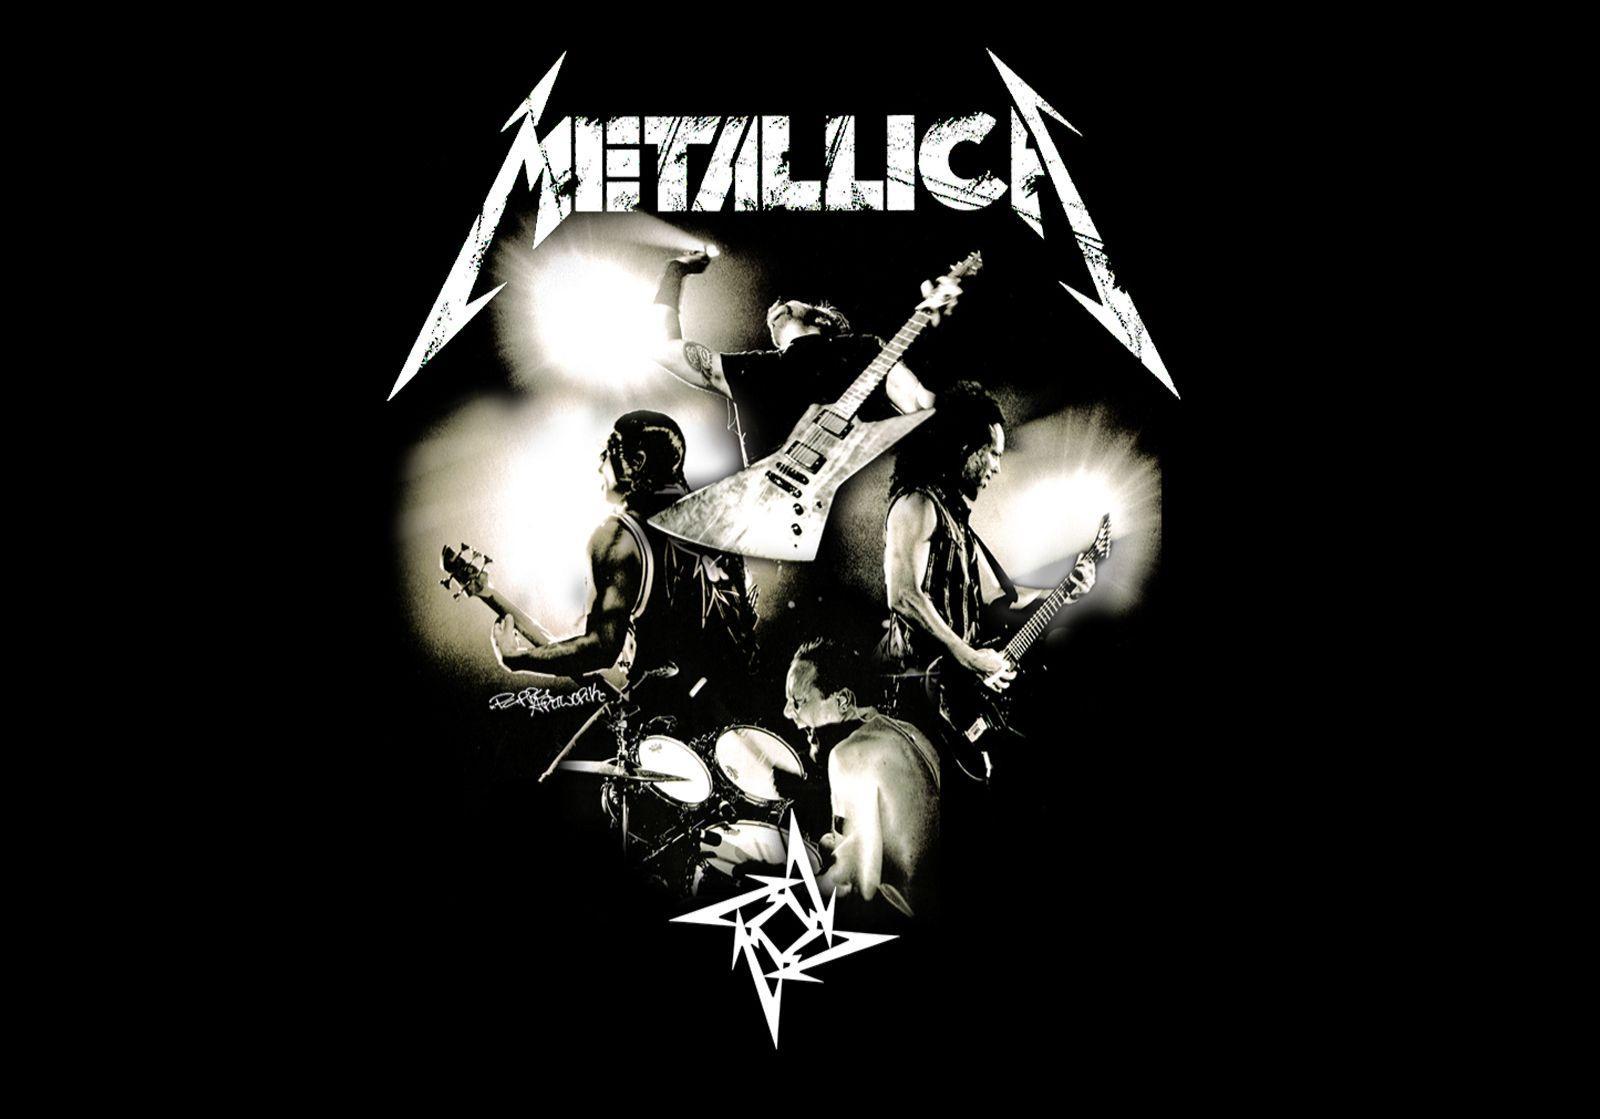 Metallica Wallpapers Top Free Metallica Backgrounds Wallpaperaccess